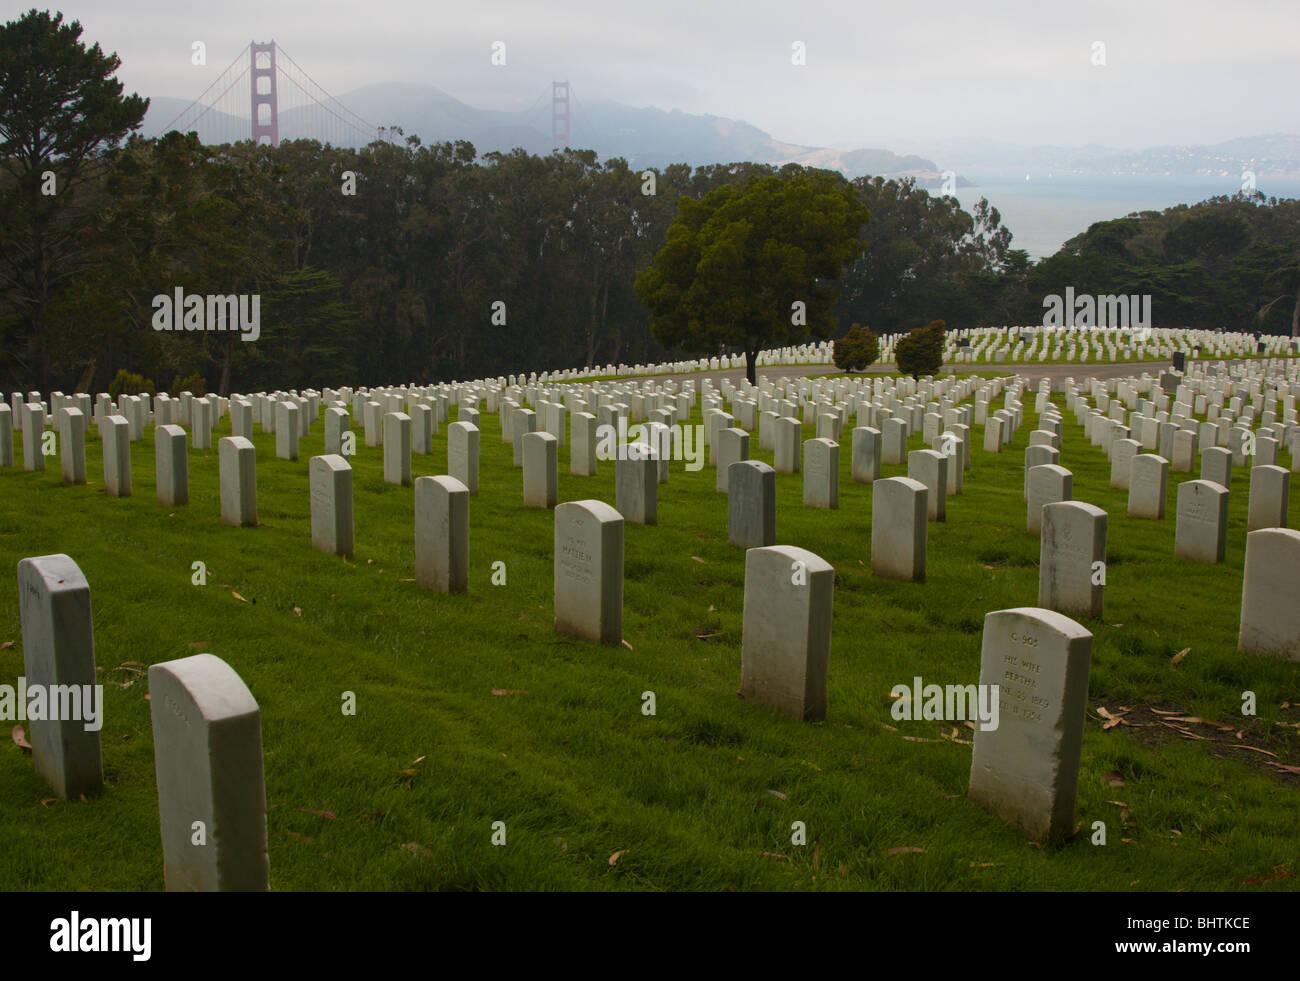 Graves in San Francisco National Cemetery at the Presidio, San Francisco Stock Photo